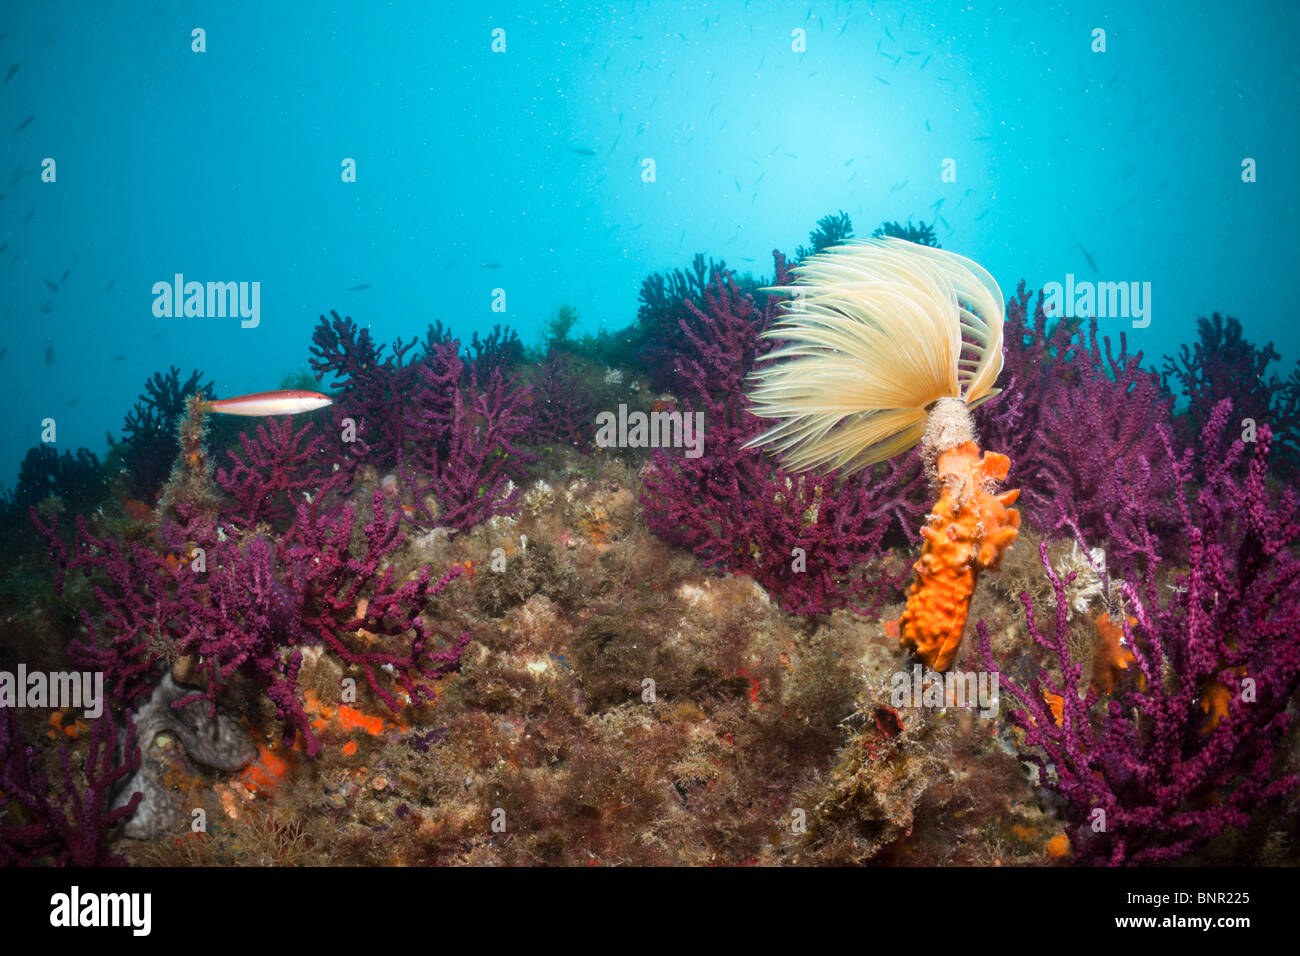 Spiral Tube Worm in Coral Reef, Spirographis spallanzani, Cap de Creus, Costa Brava, Spain Stock Photo